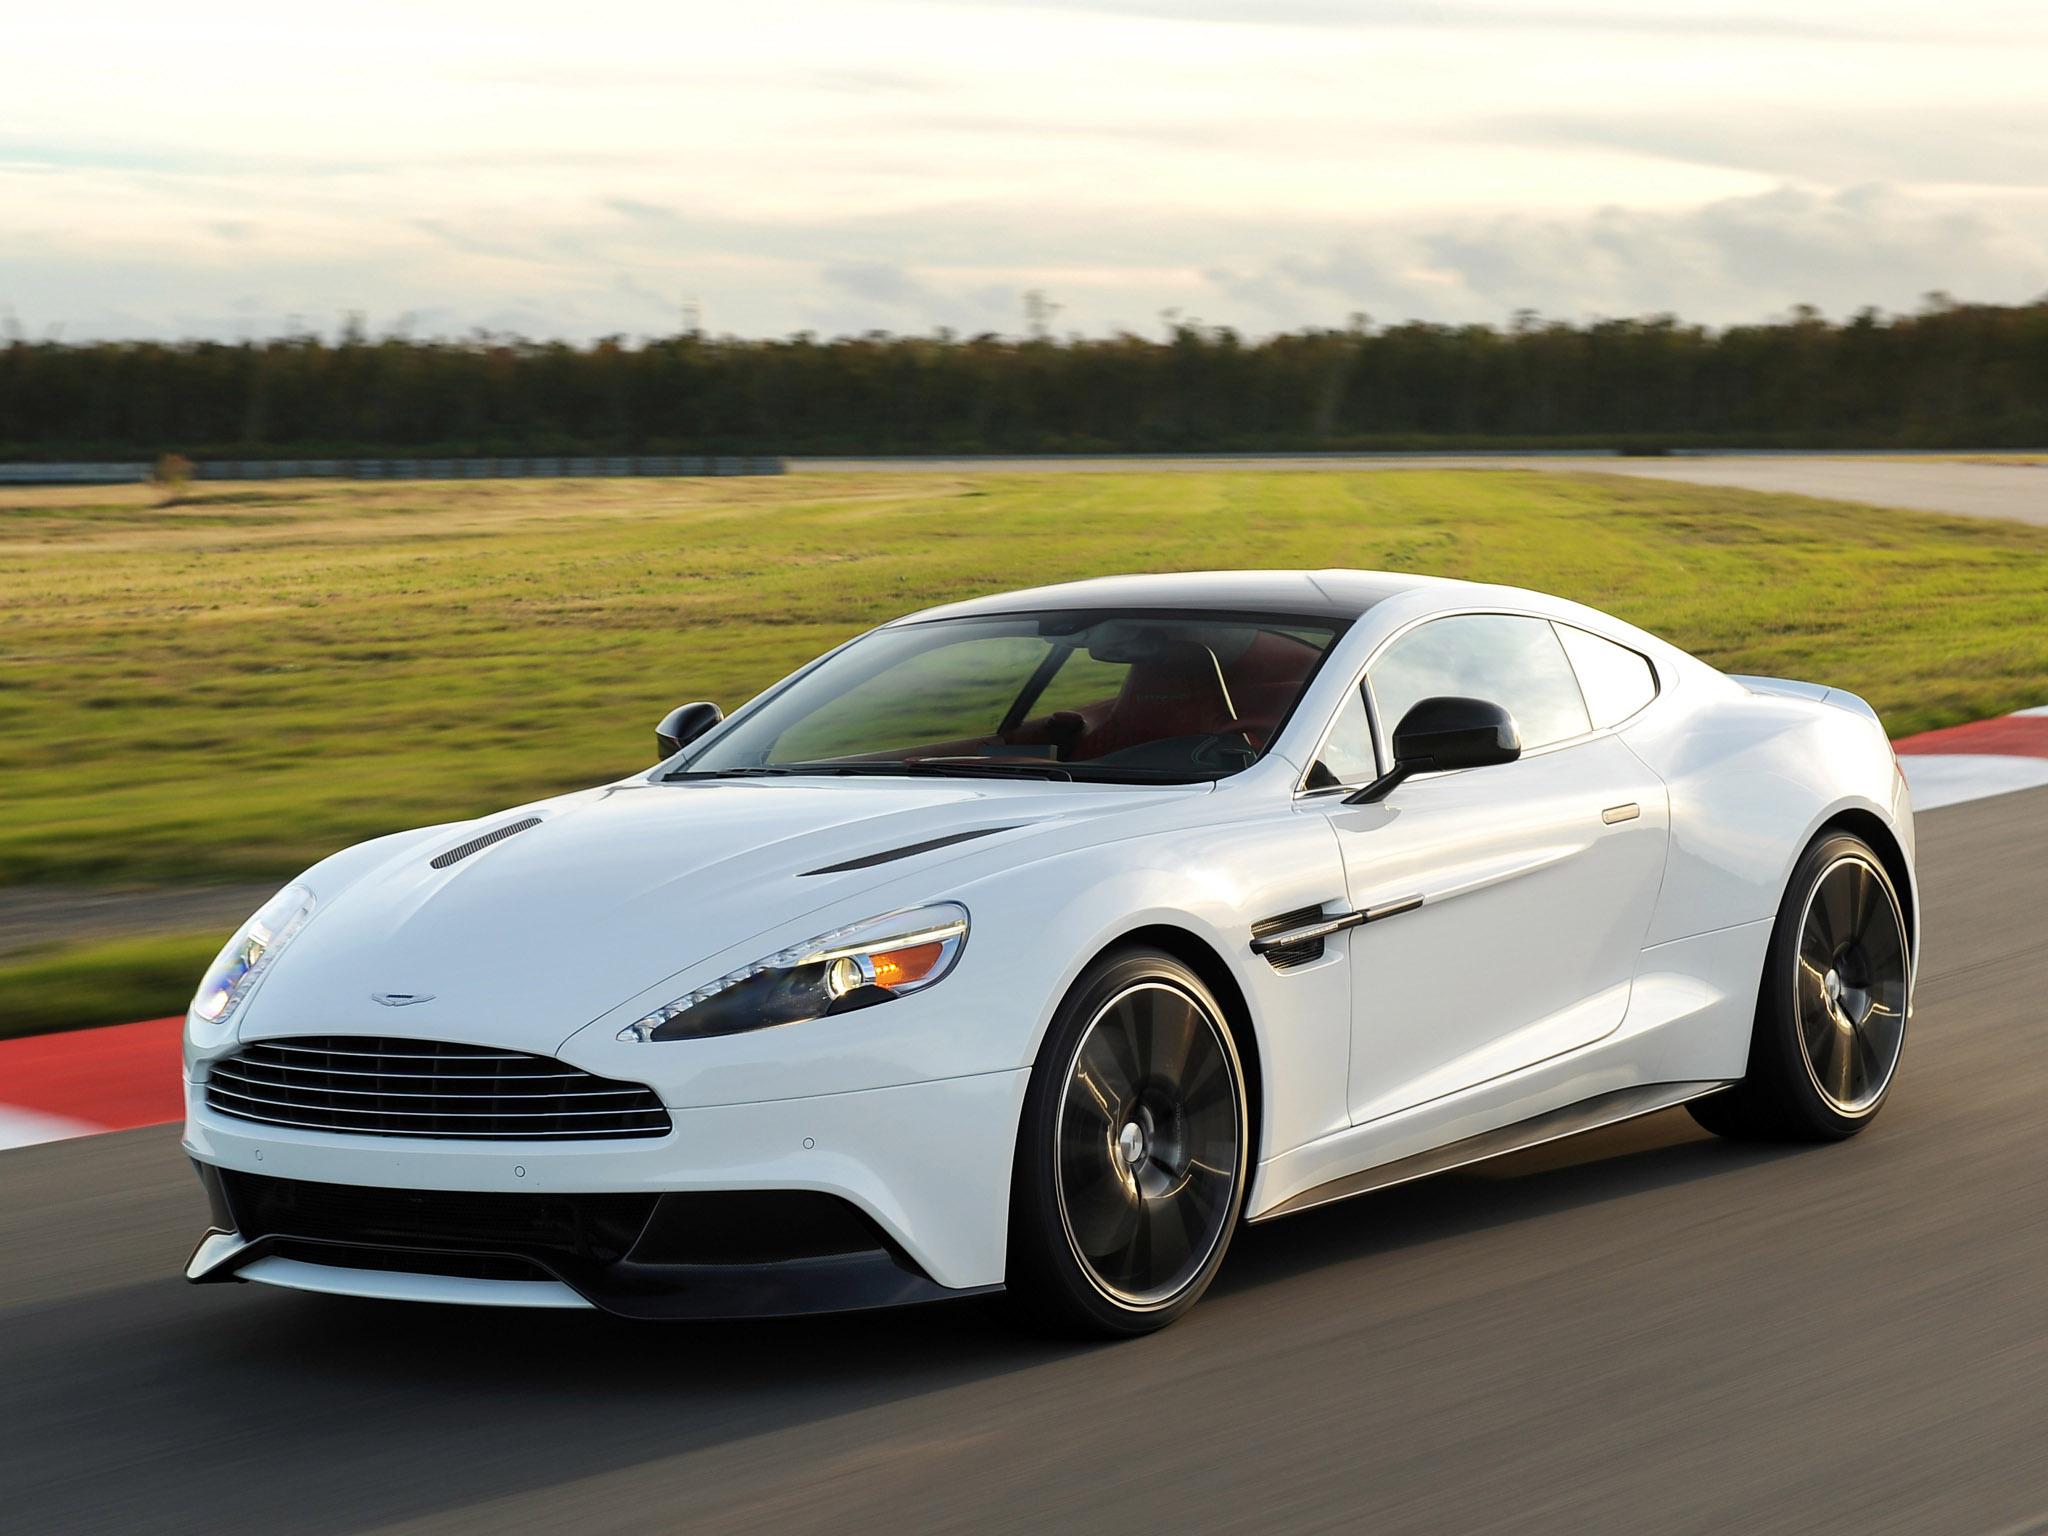 2012 Aston Martin Vanquish Usa Sportcar Wallpaper